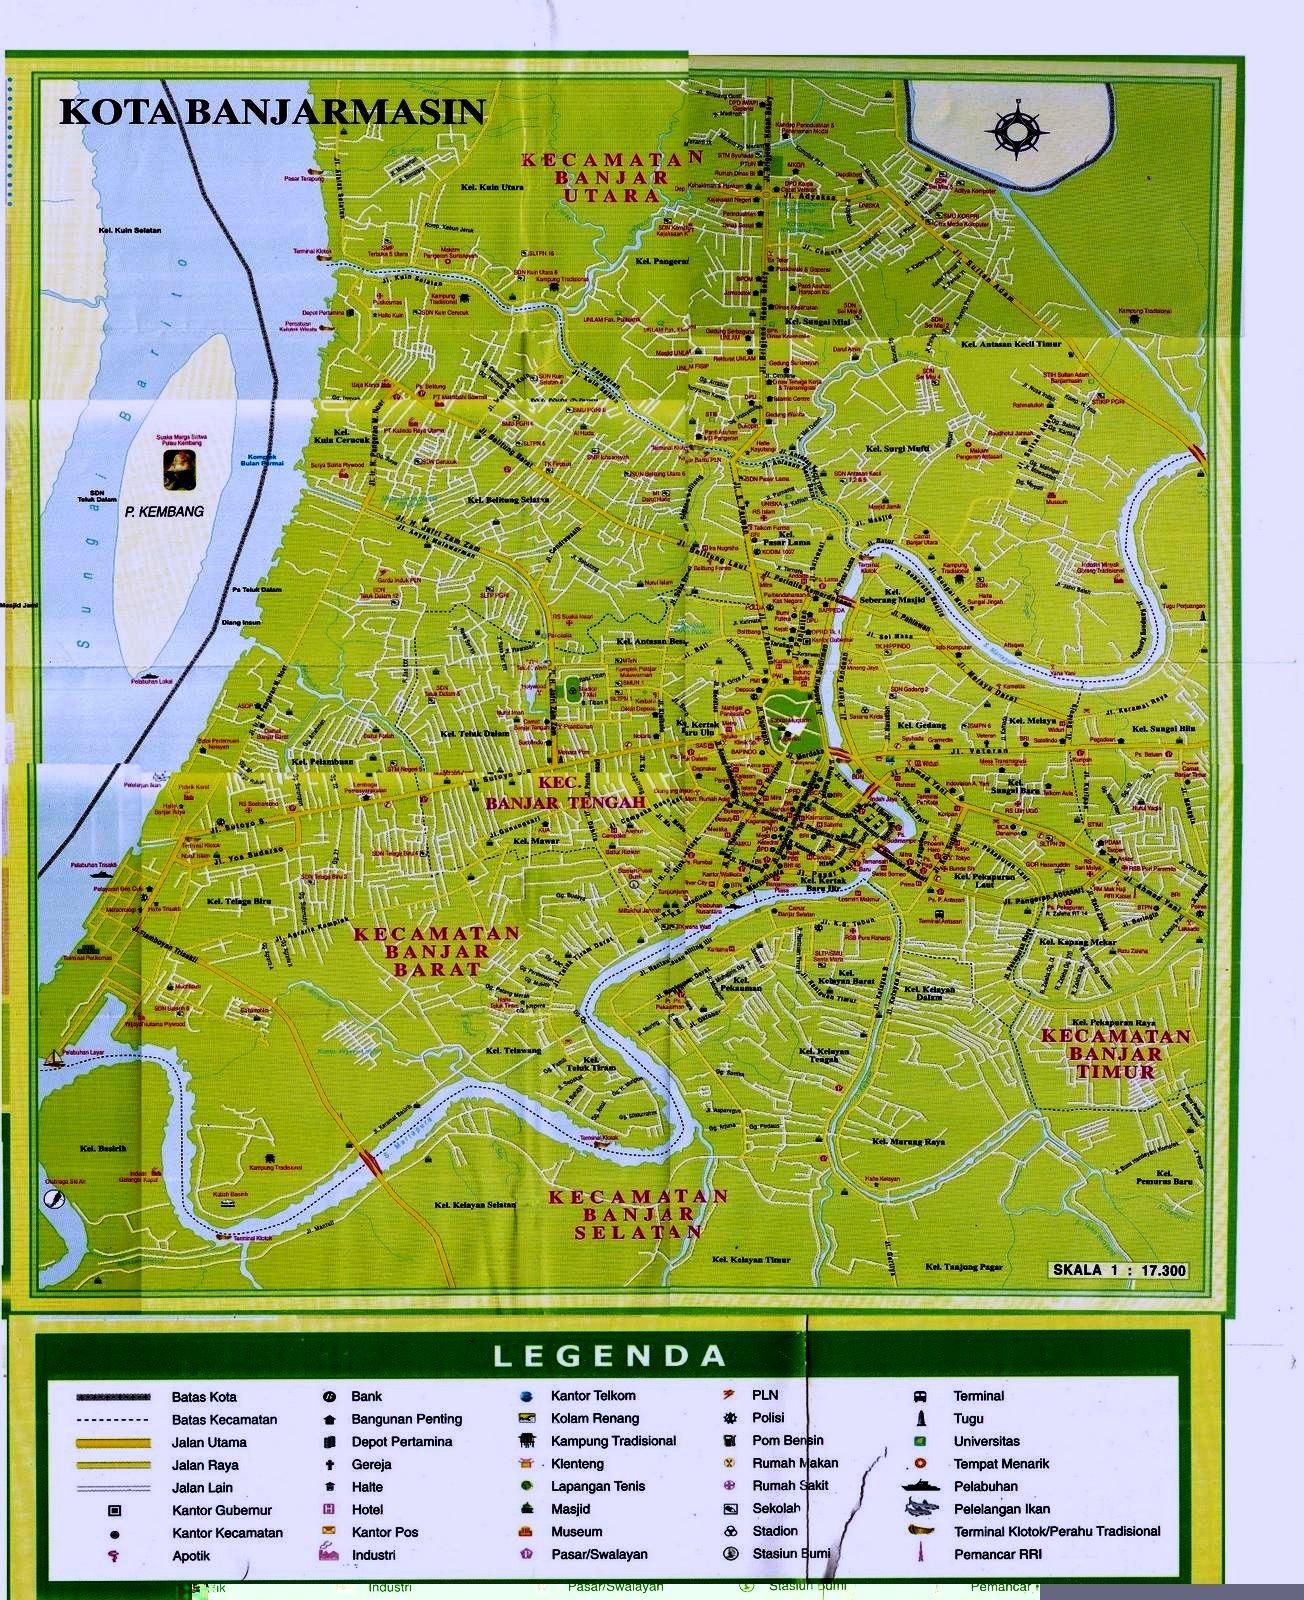 Gold-oriole: Daftar Nama Kecamatan Kelurahan/Desa ...